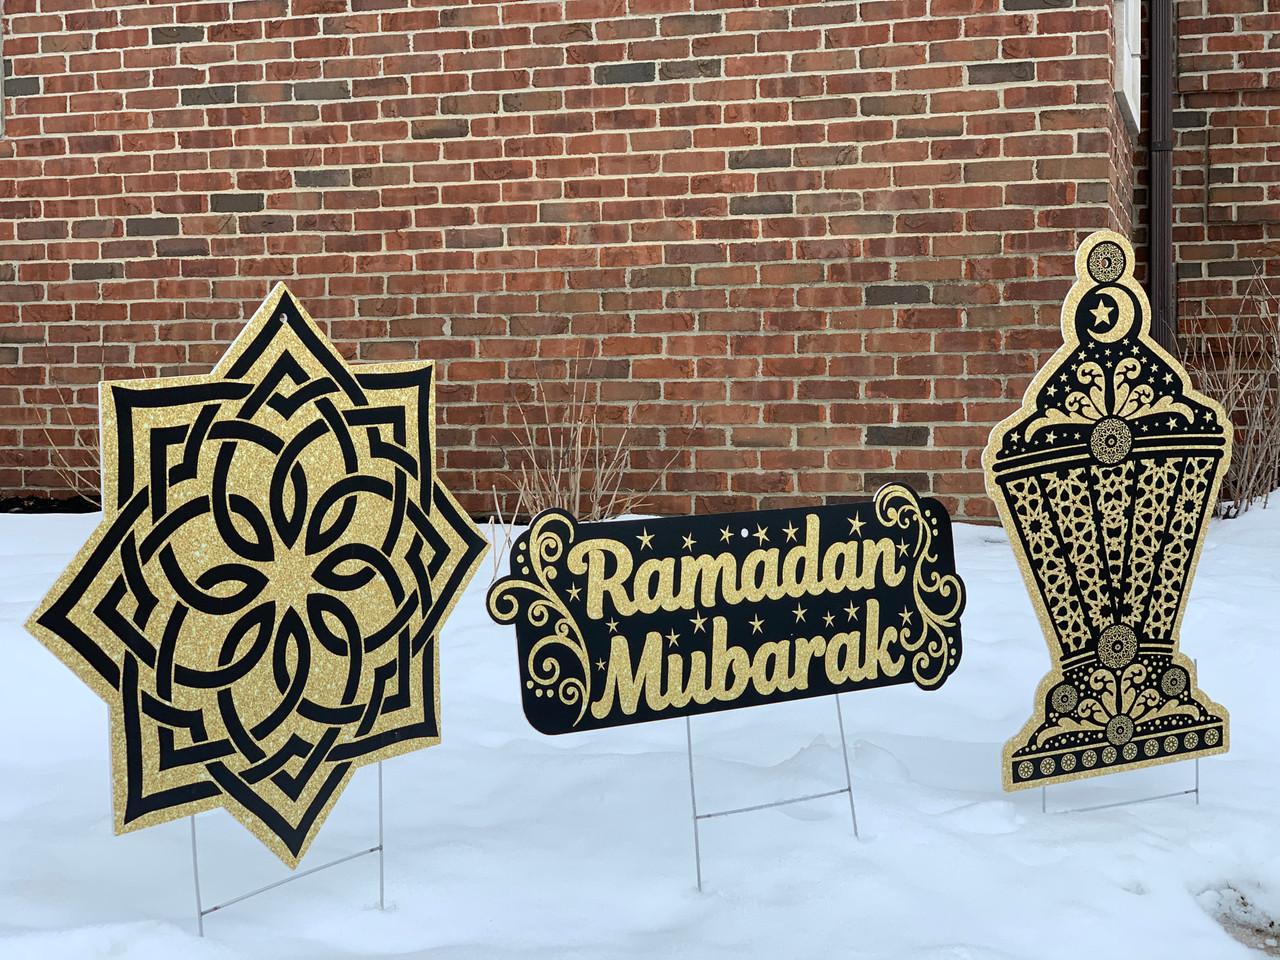 Ramadan Mubarak Large Yard Sign-Multi Use Indoor/Outdoor (Stake Included)